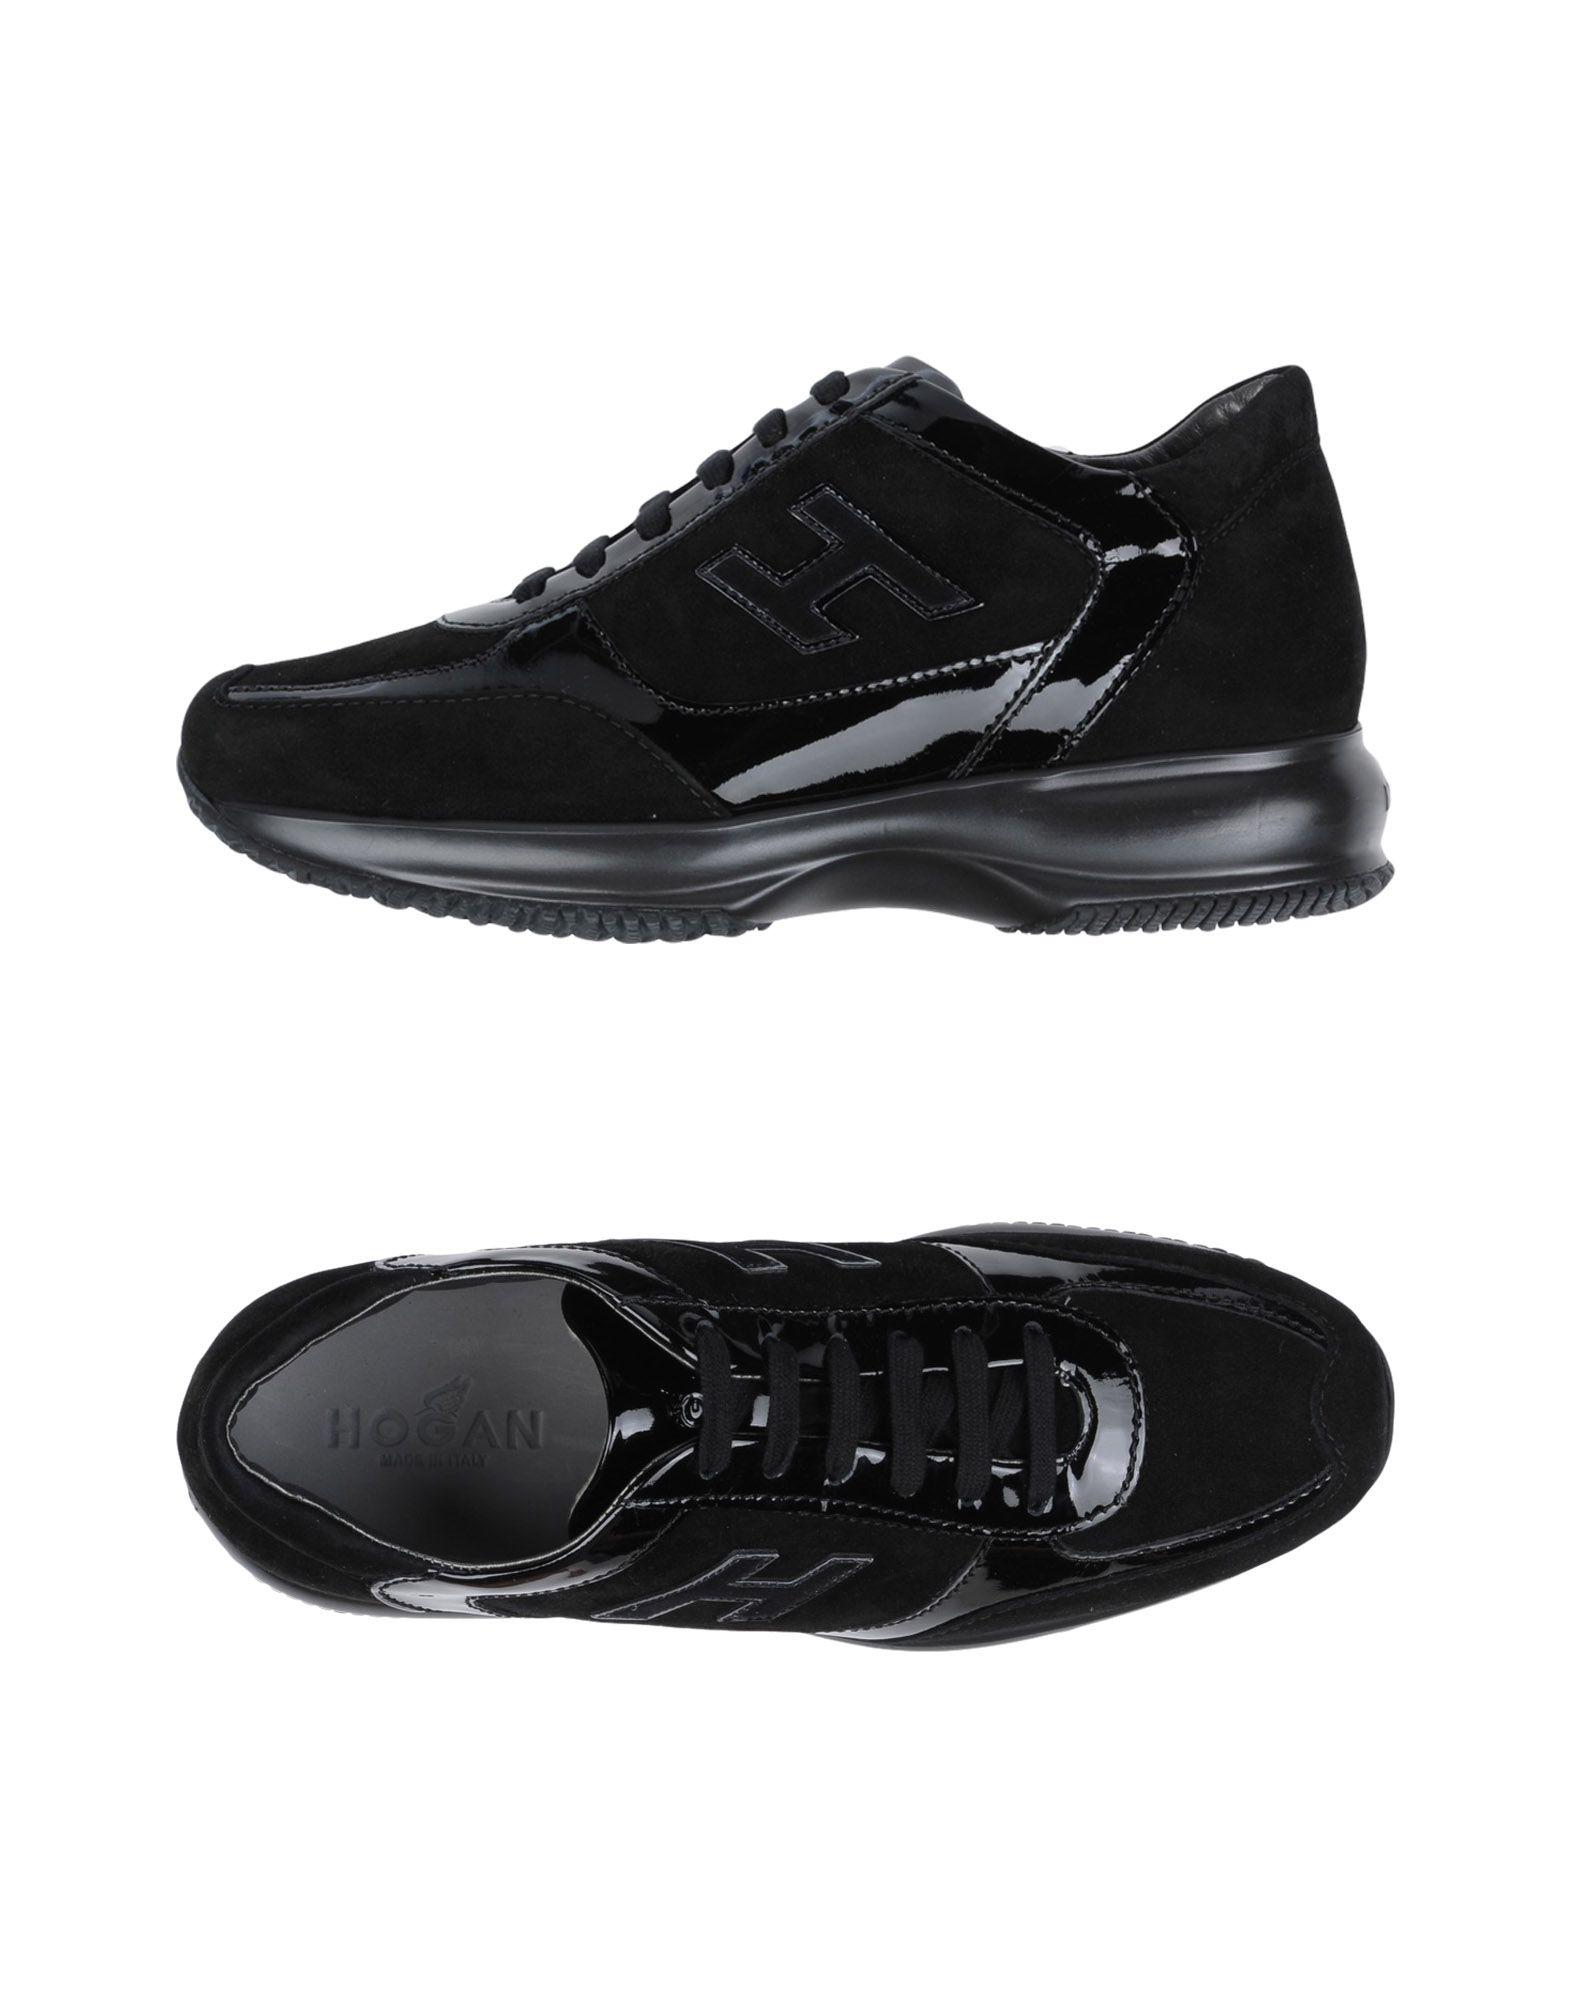 Hogan Sneakers Damen Schuhe  11292408BKGut aussehende strapazierfähige Schuhe Damen b59f87